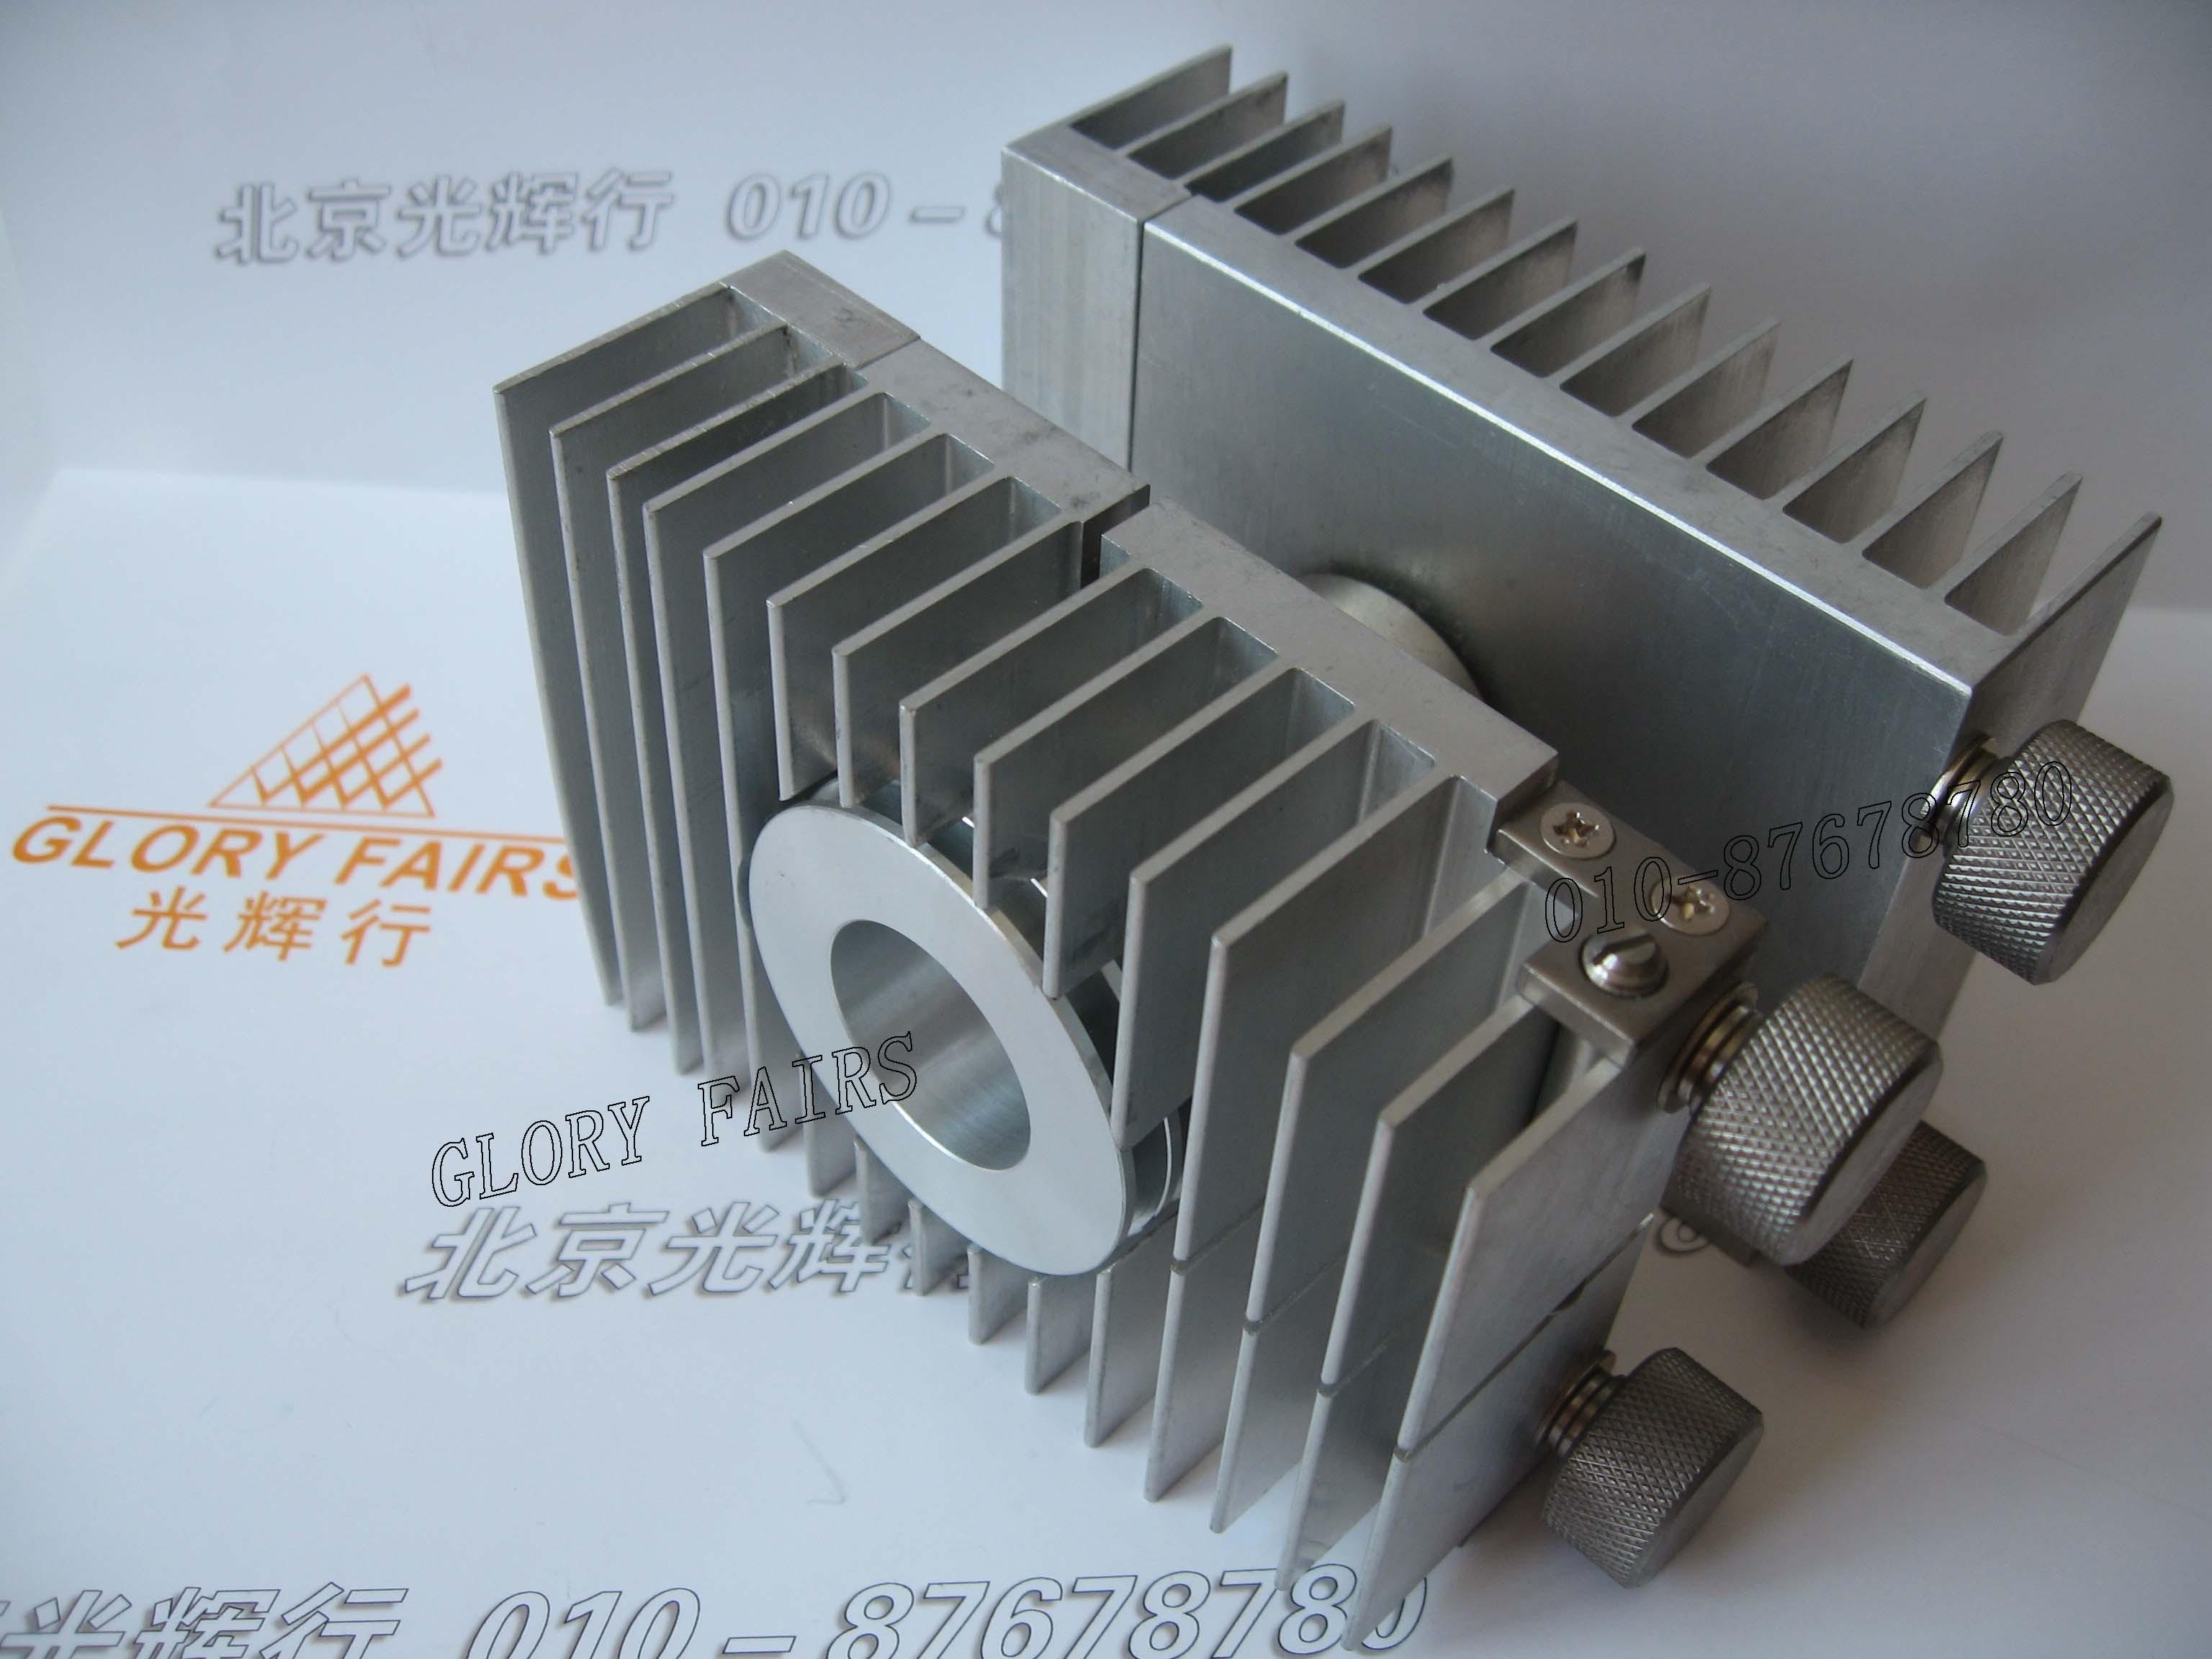 300w xenon arc lamp heat sinker unit,for oem endoscope ...